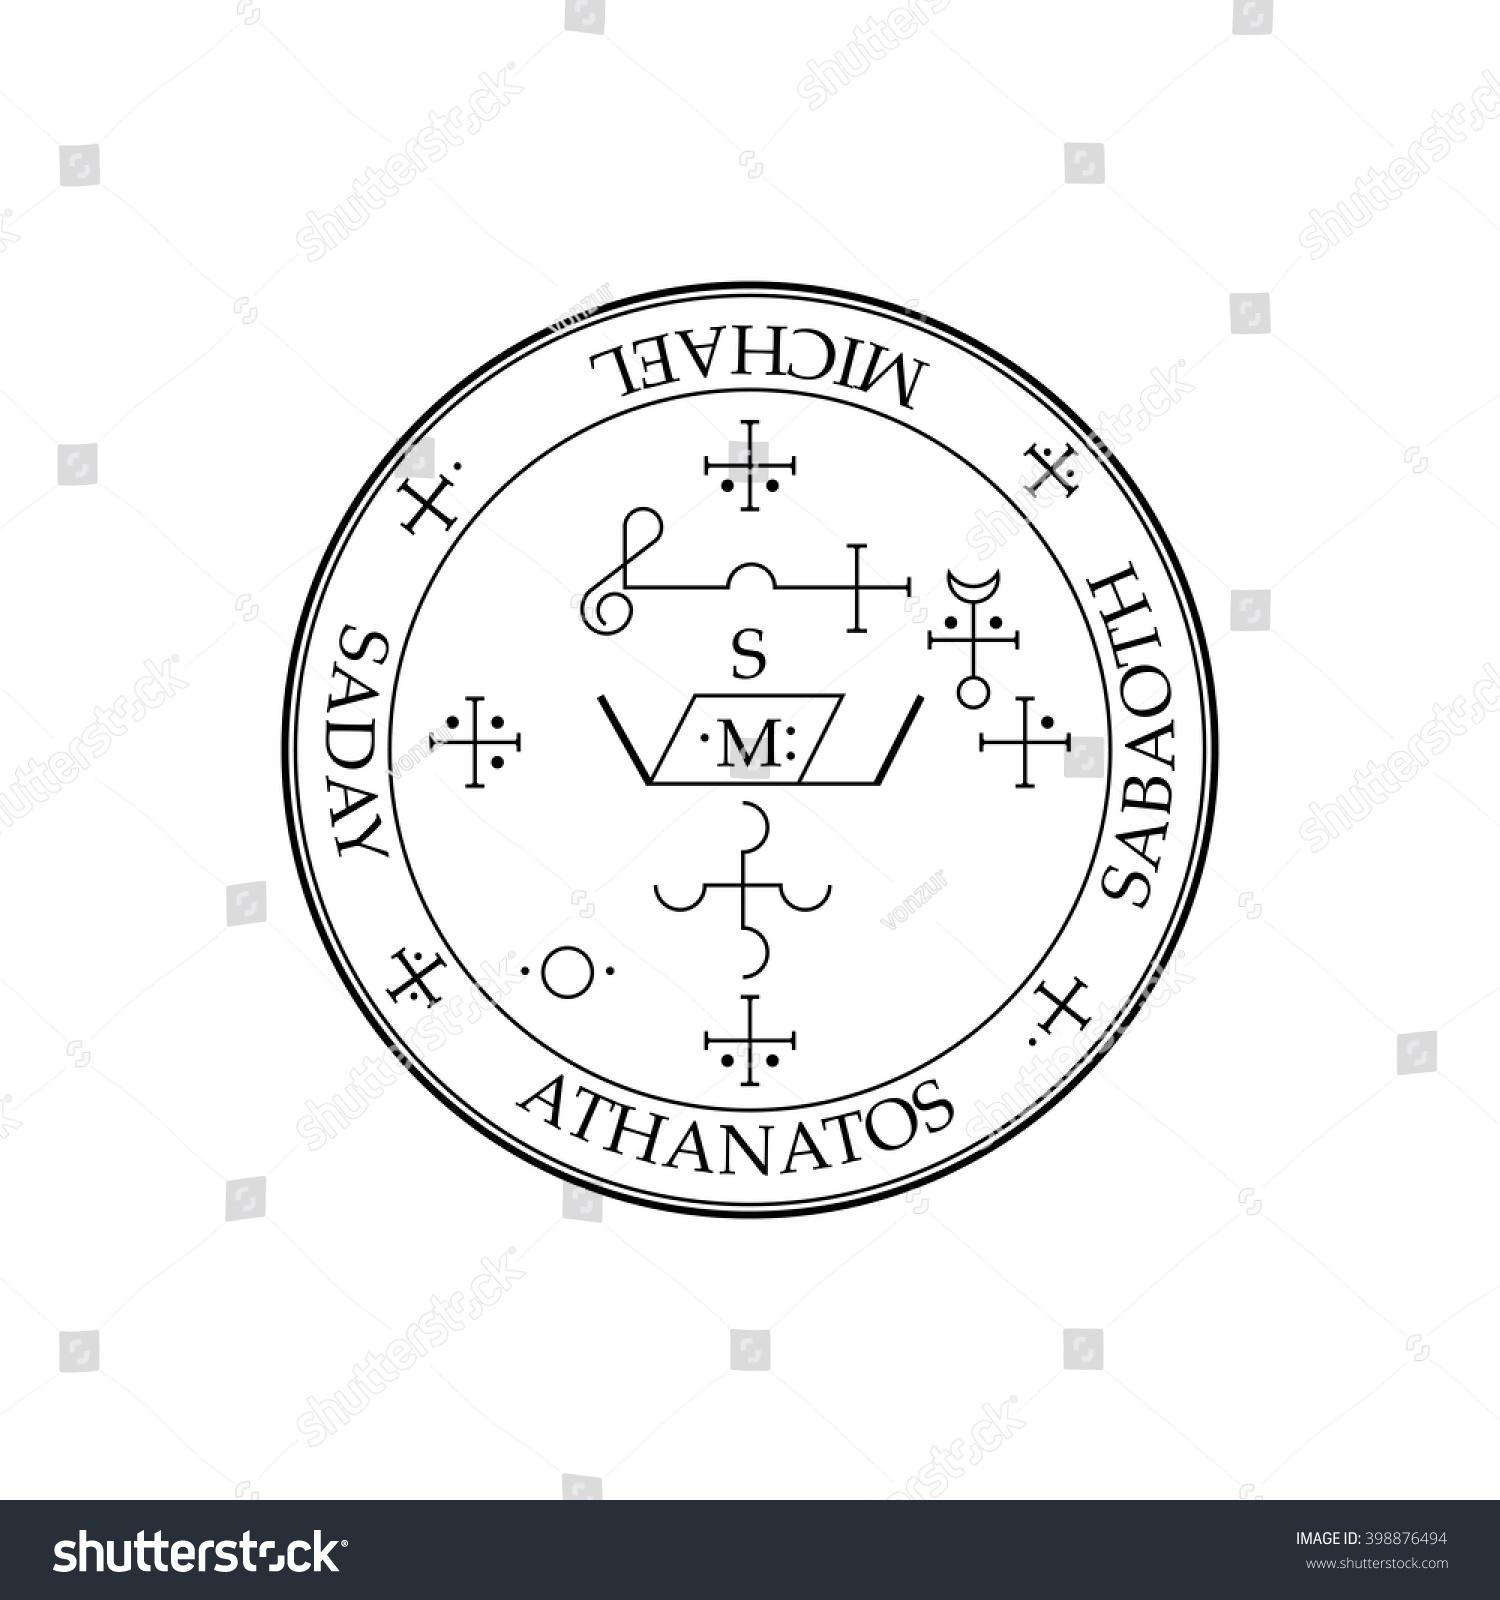 Royalty-free Sigil of Archangel Michael  Magical Amulets